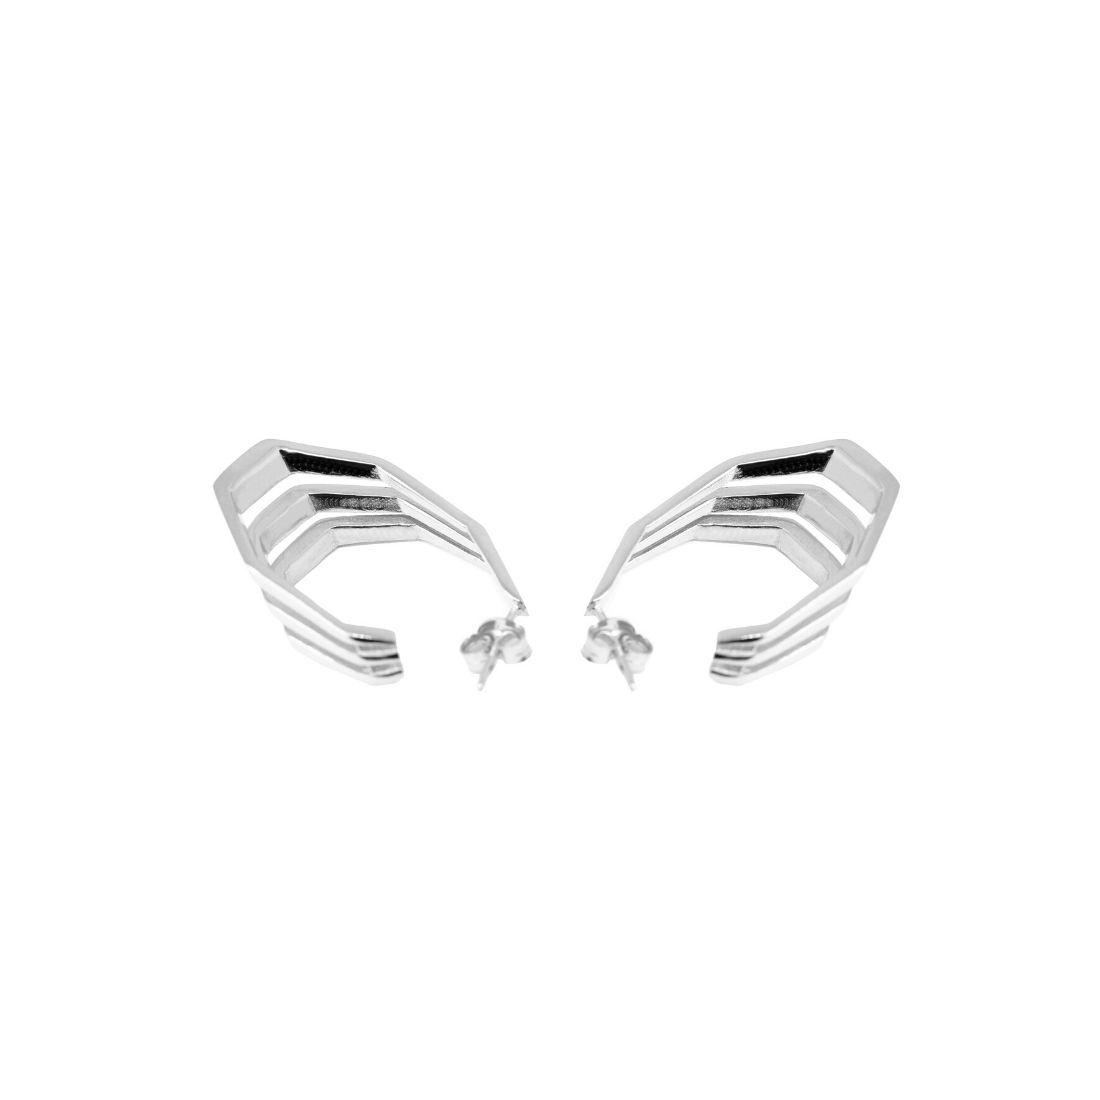 Spanish Steps Earrings 925 Sterling Silver